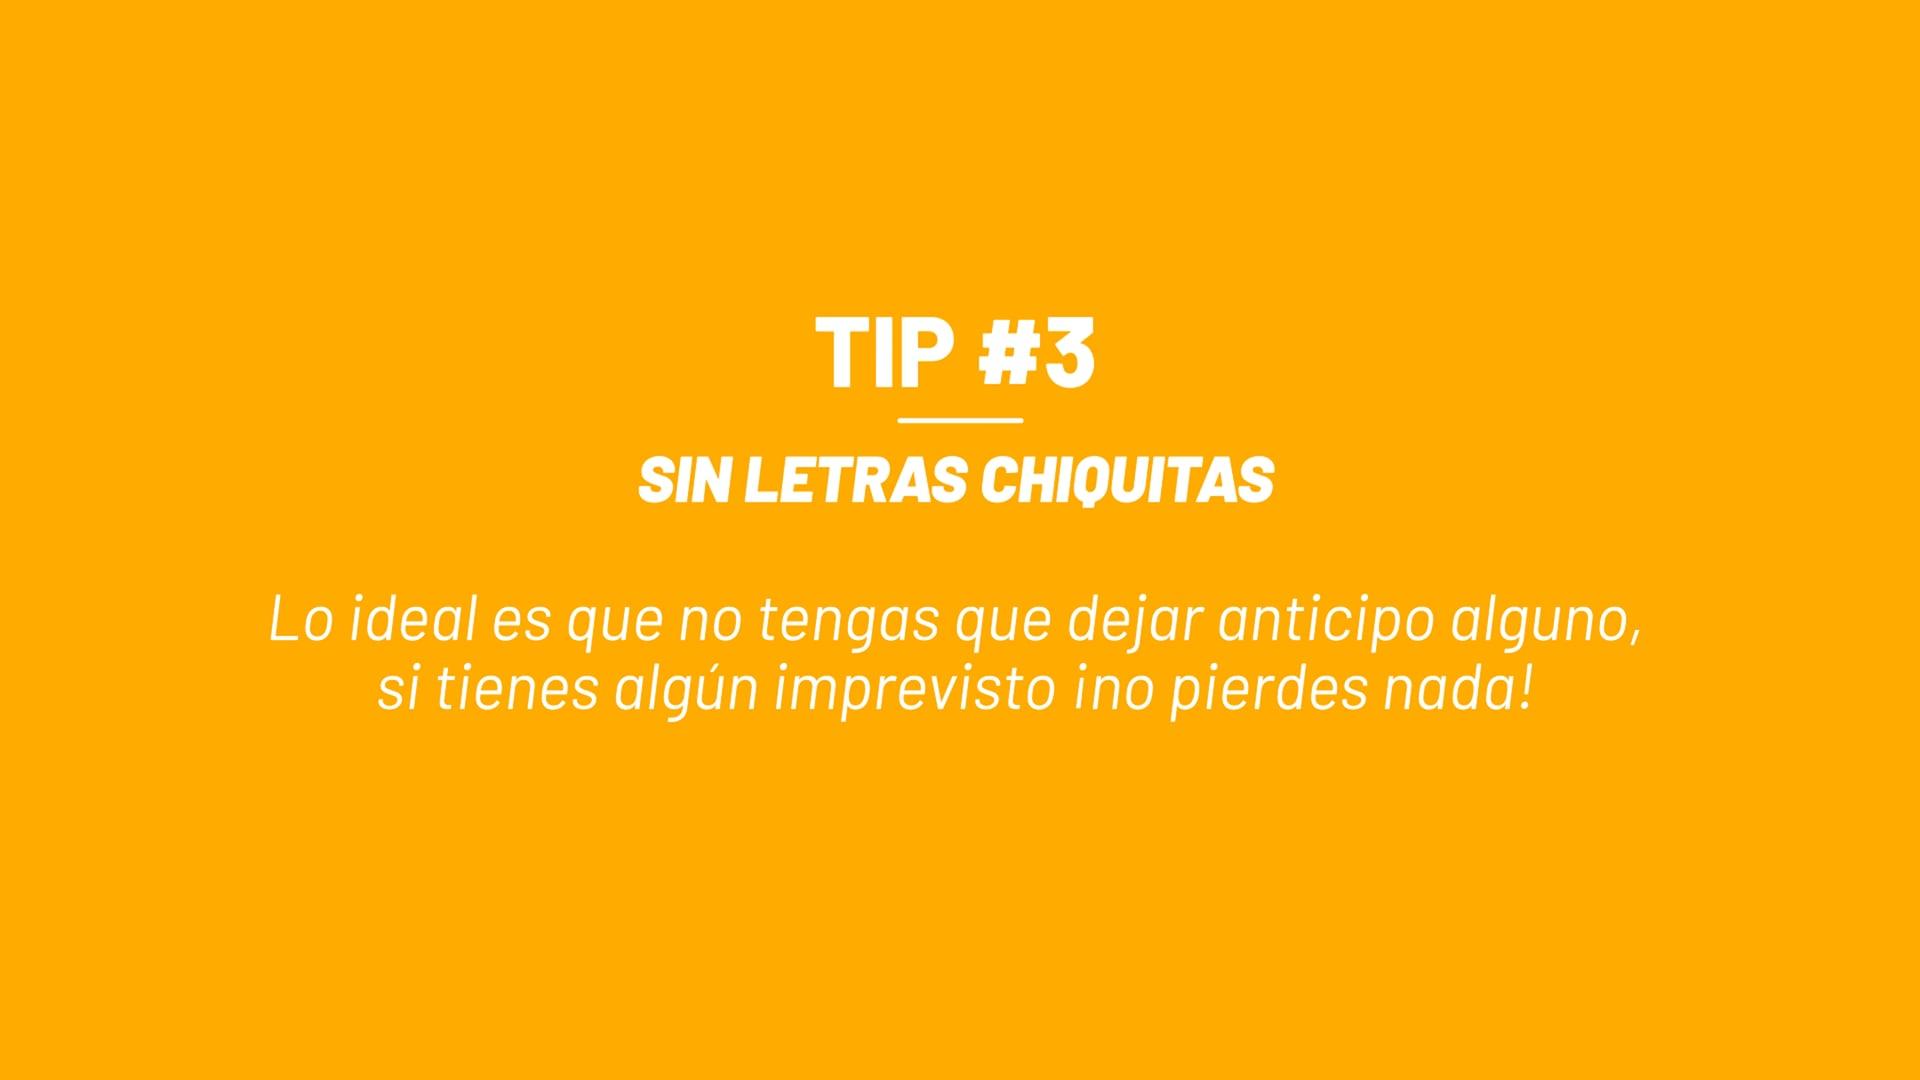 Tip #3 - Sin Letras Chiquitas